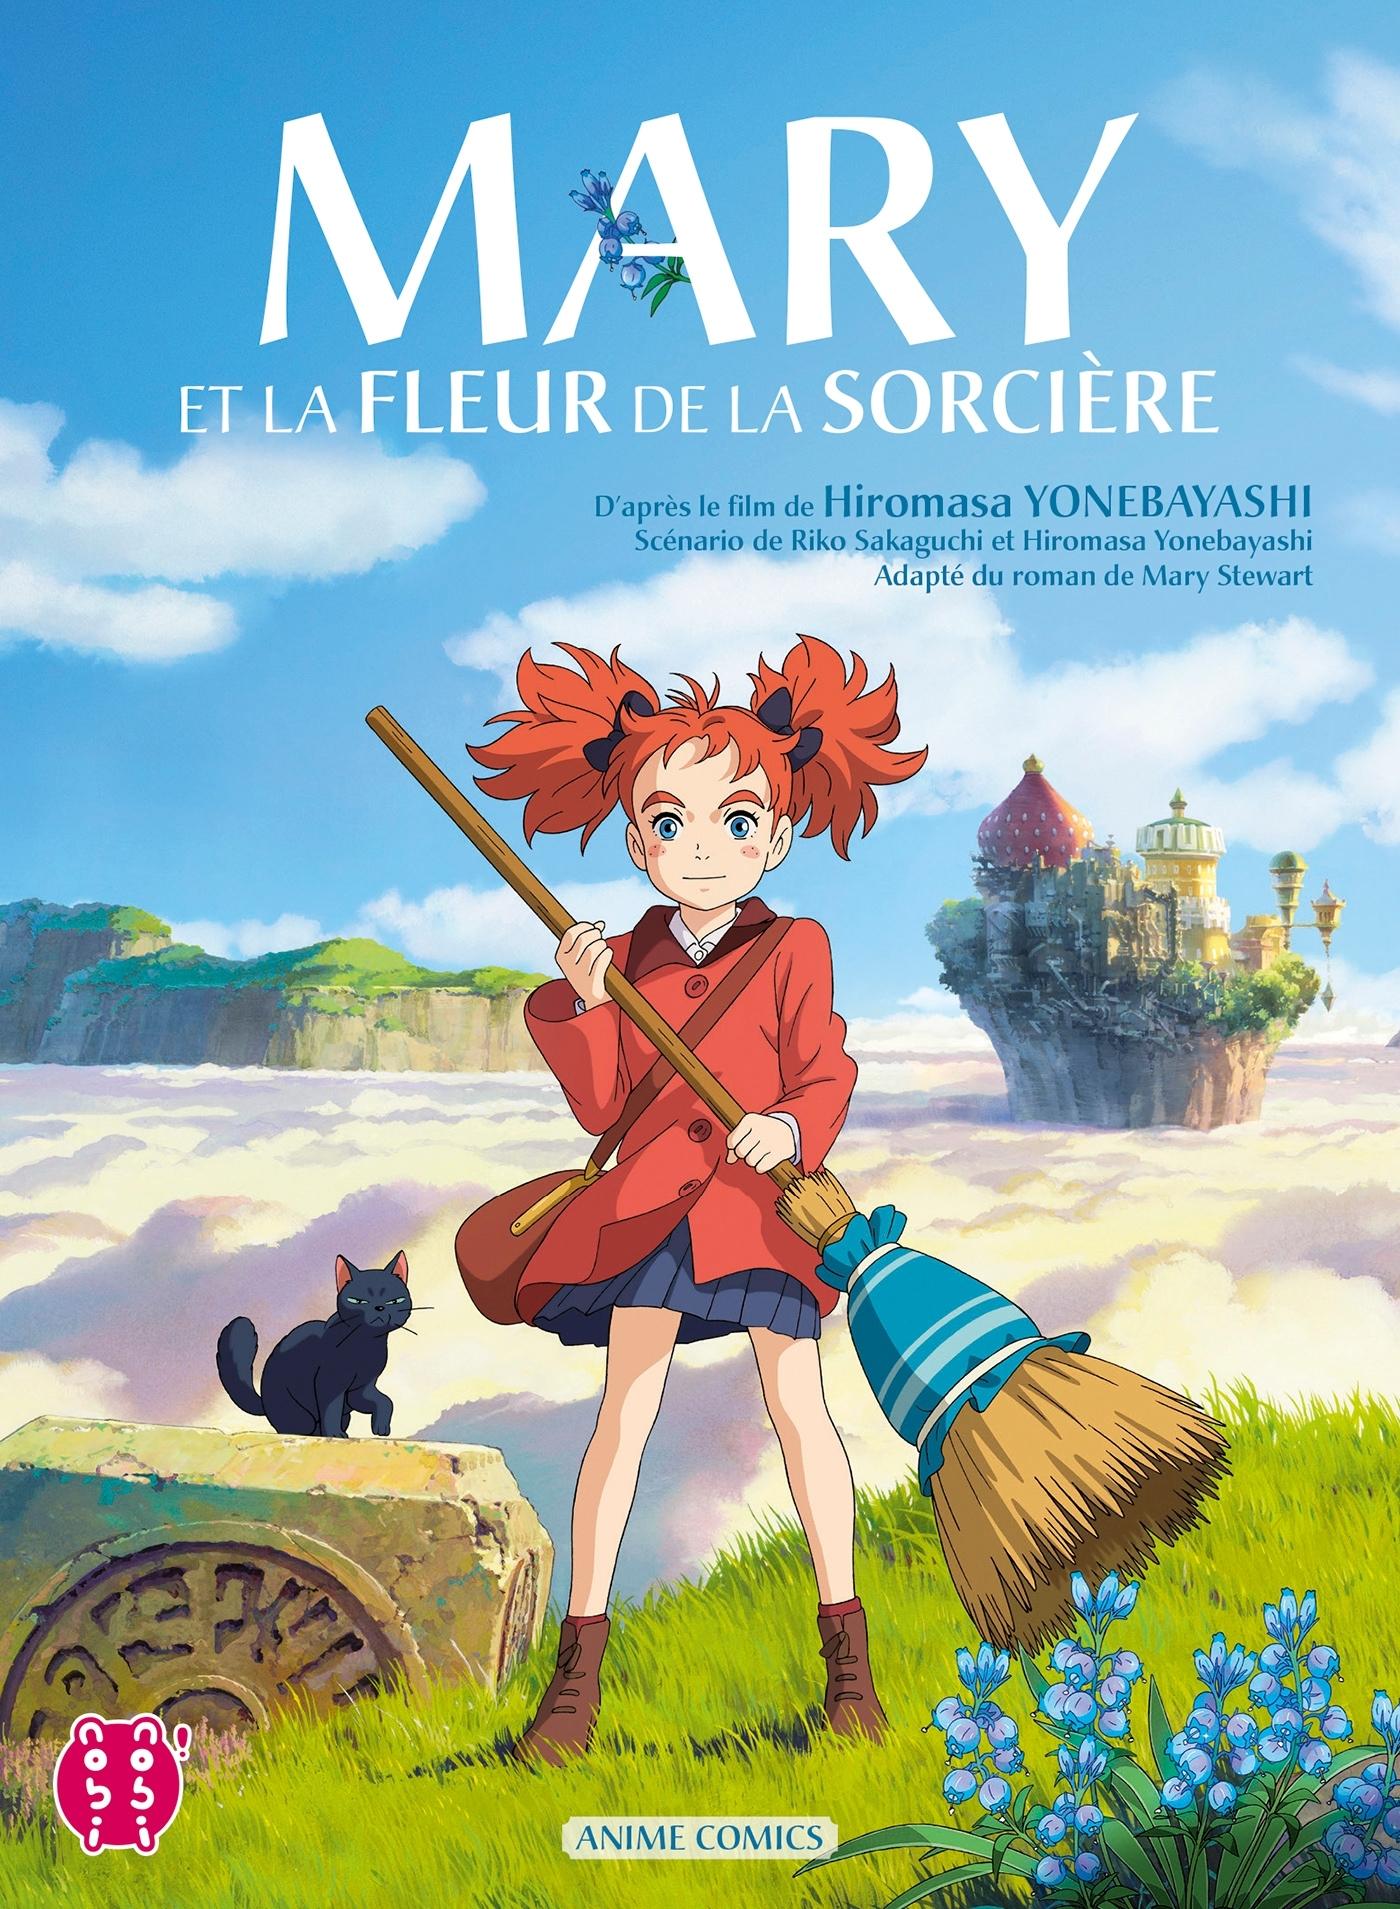 MARY ET LA FLEUR DE LA SORCIERE - ANIME COMICS